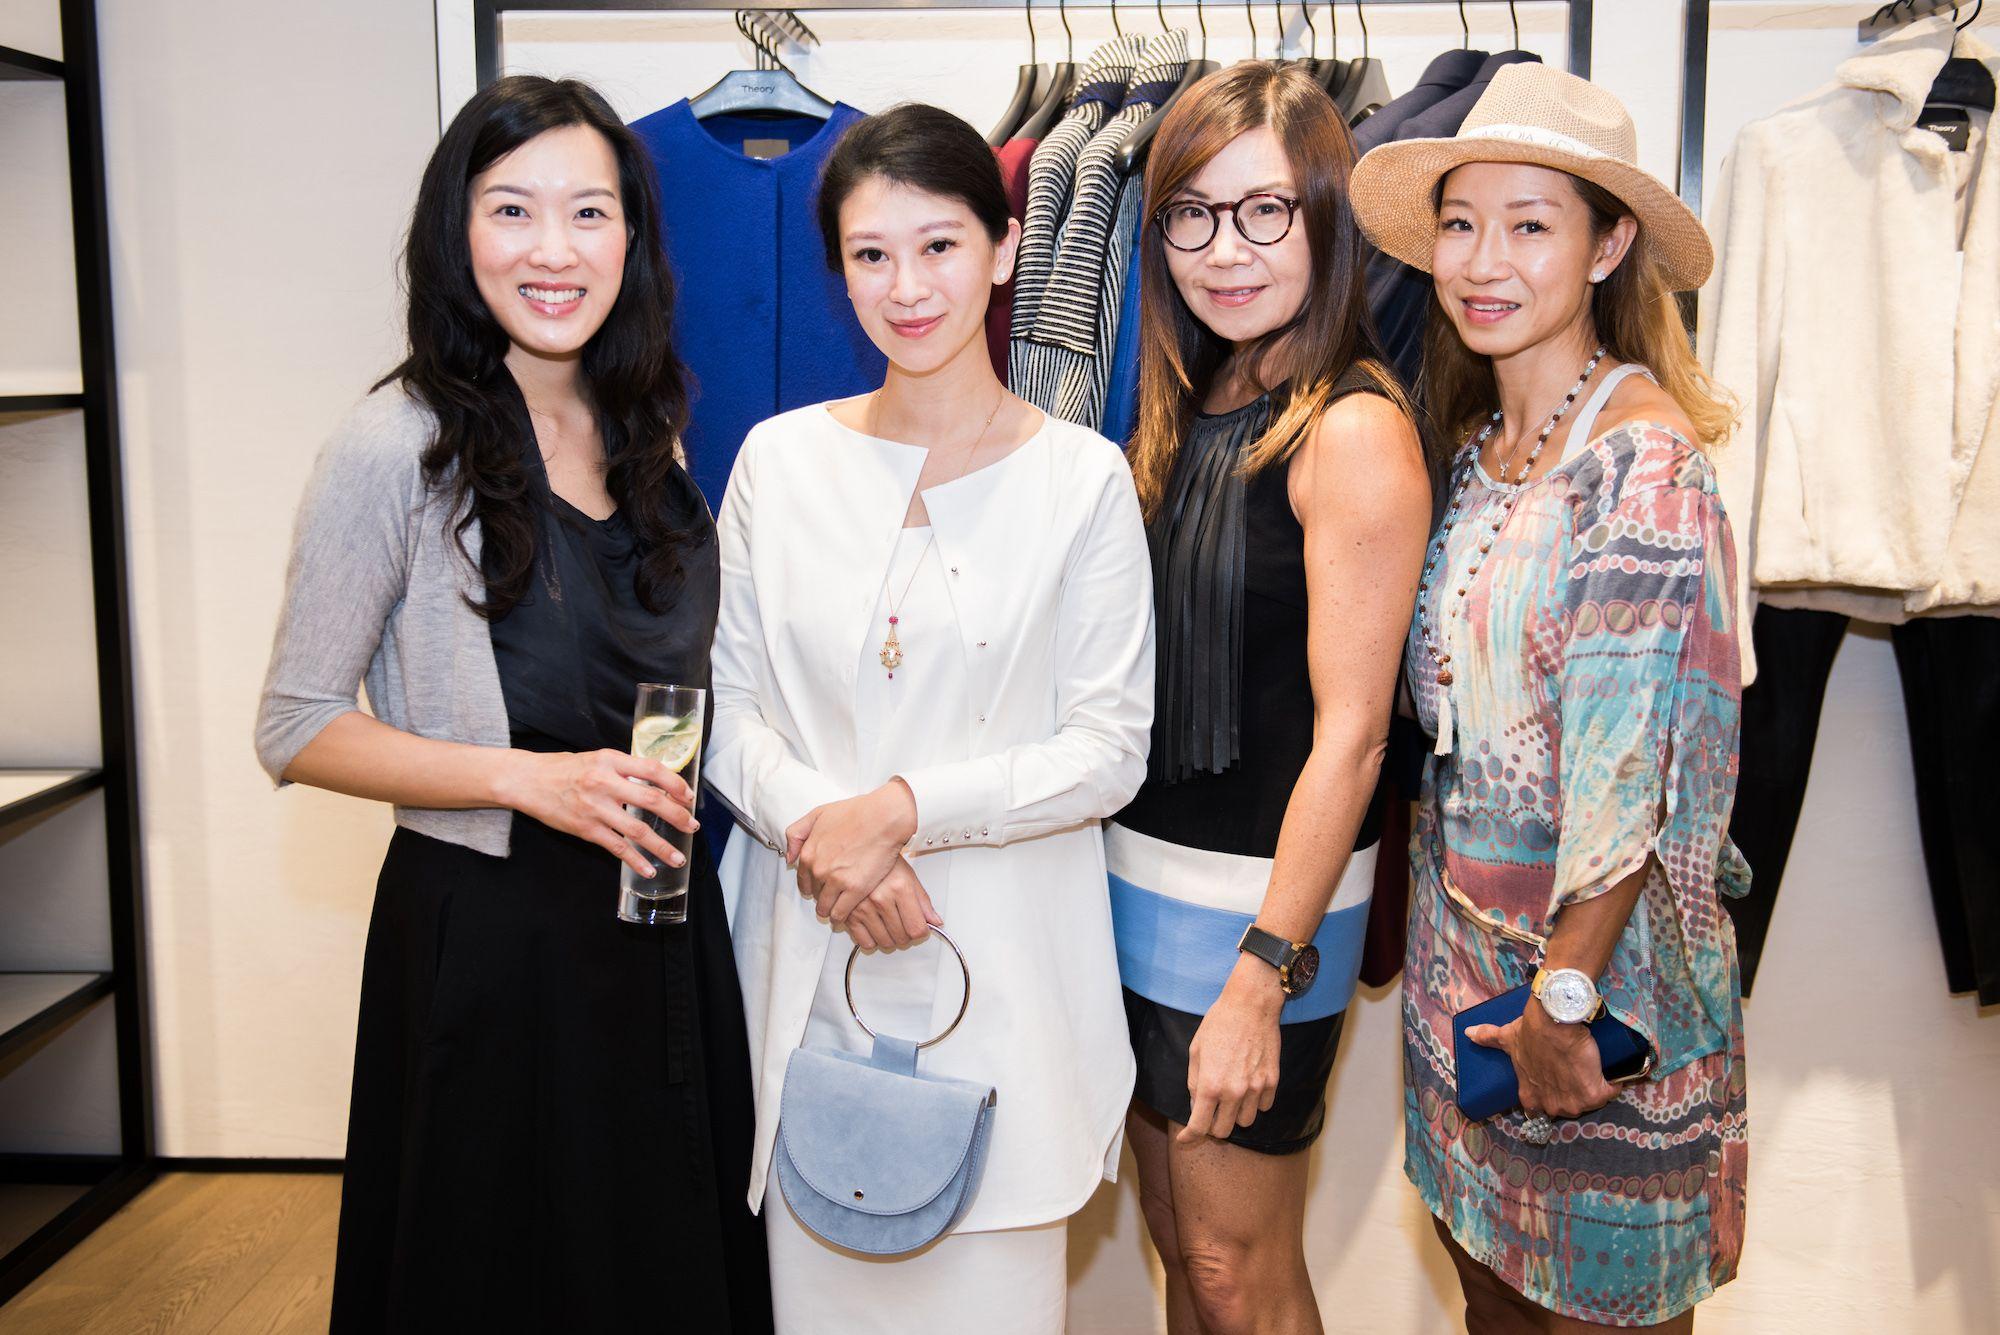 Joyce Tam, Christy Liang, Esther Ma, Christianne Ho